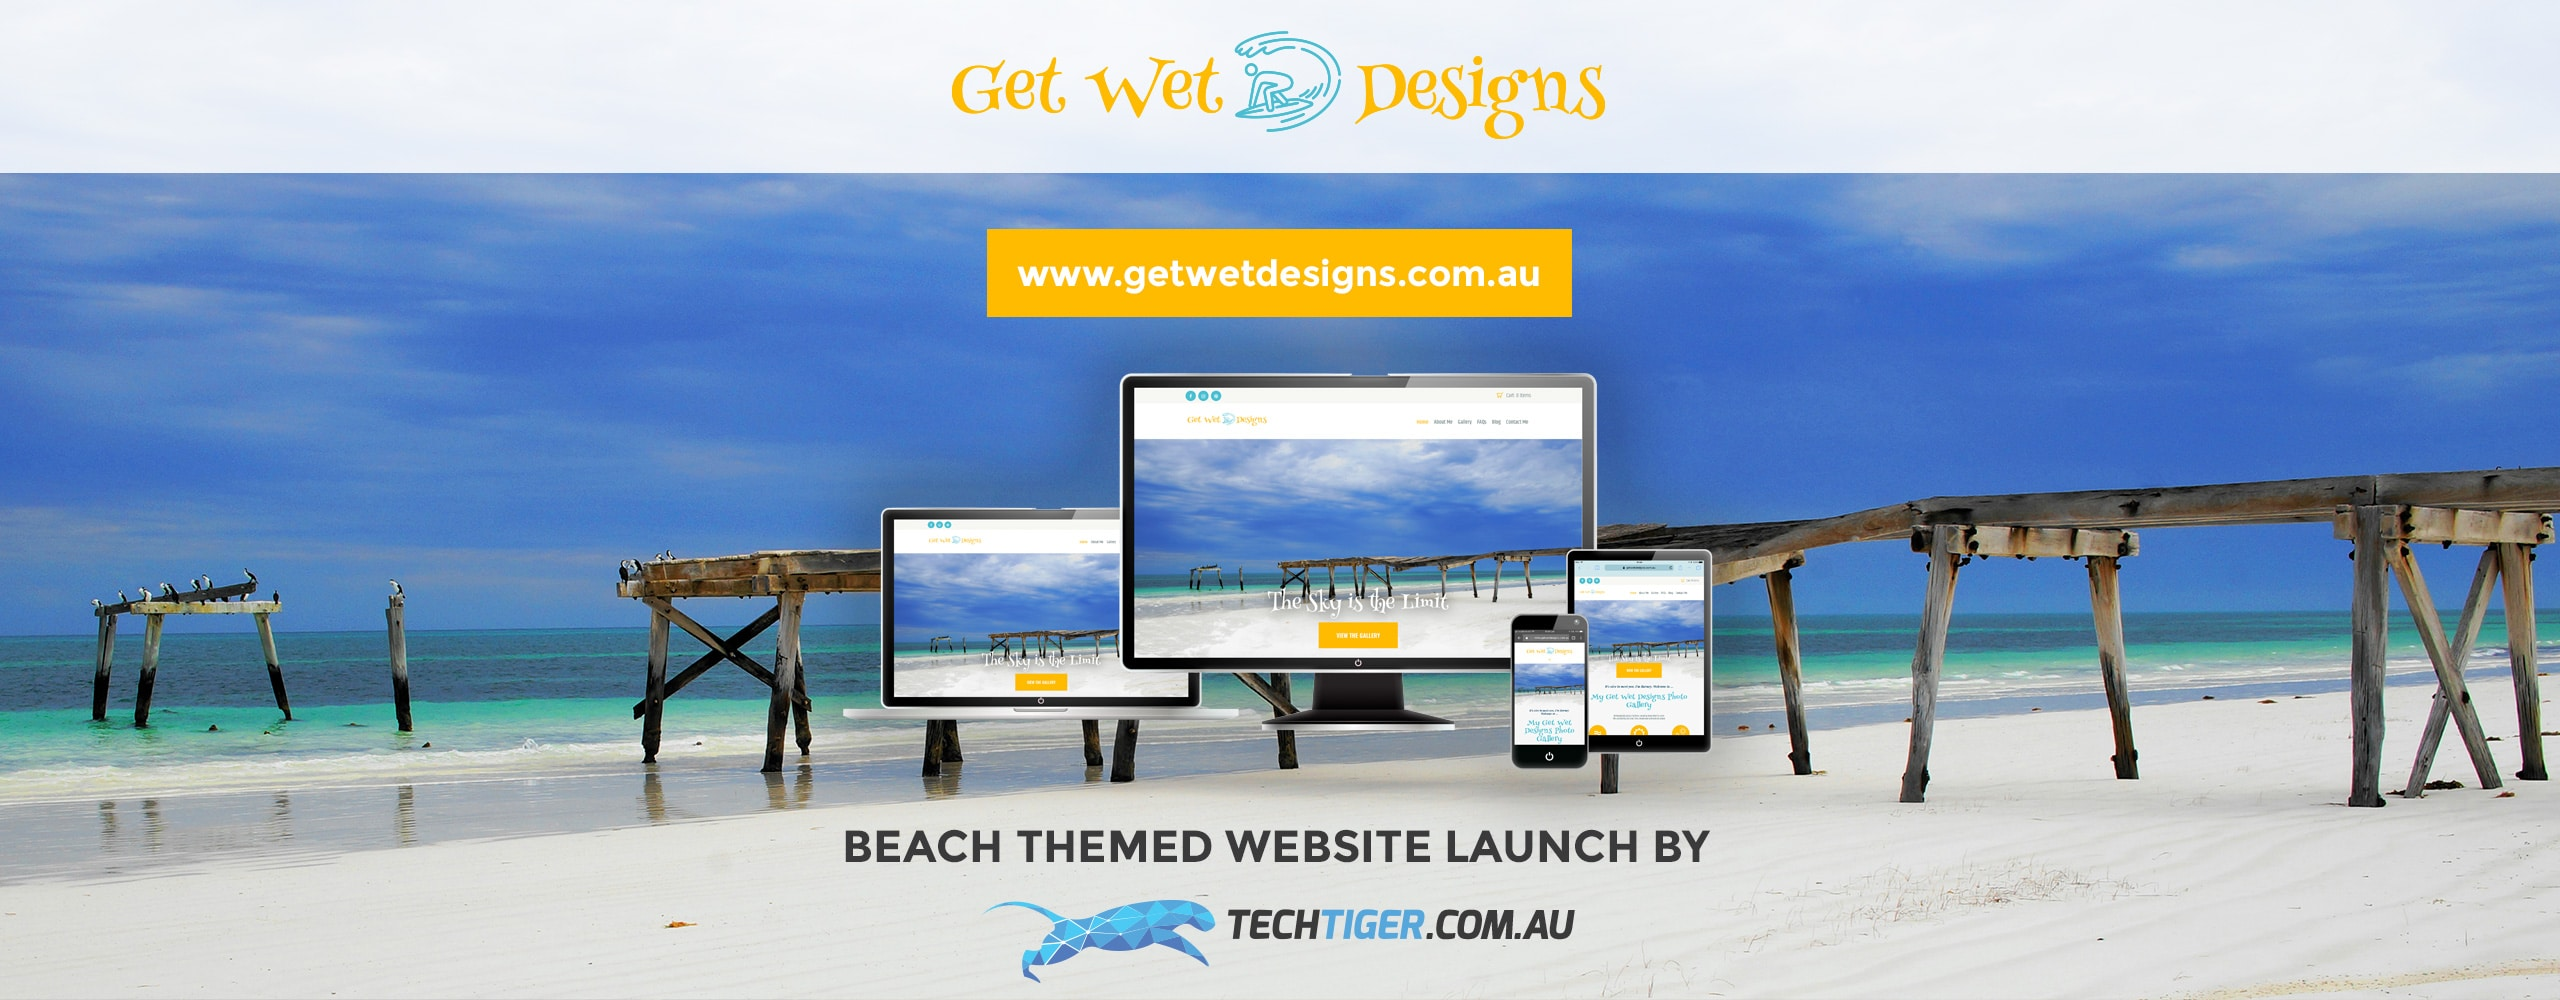 TechTiger: Beach Themed Websites for Get Wet Designs